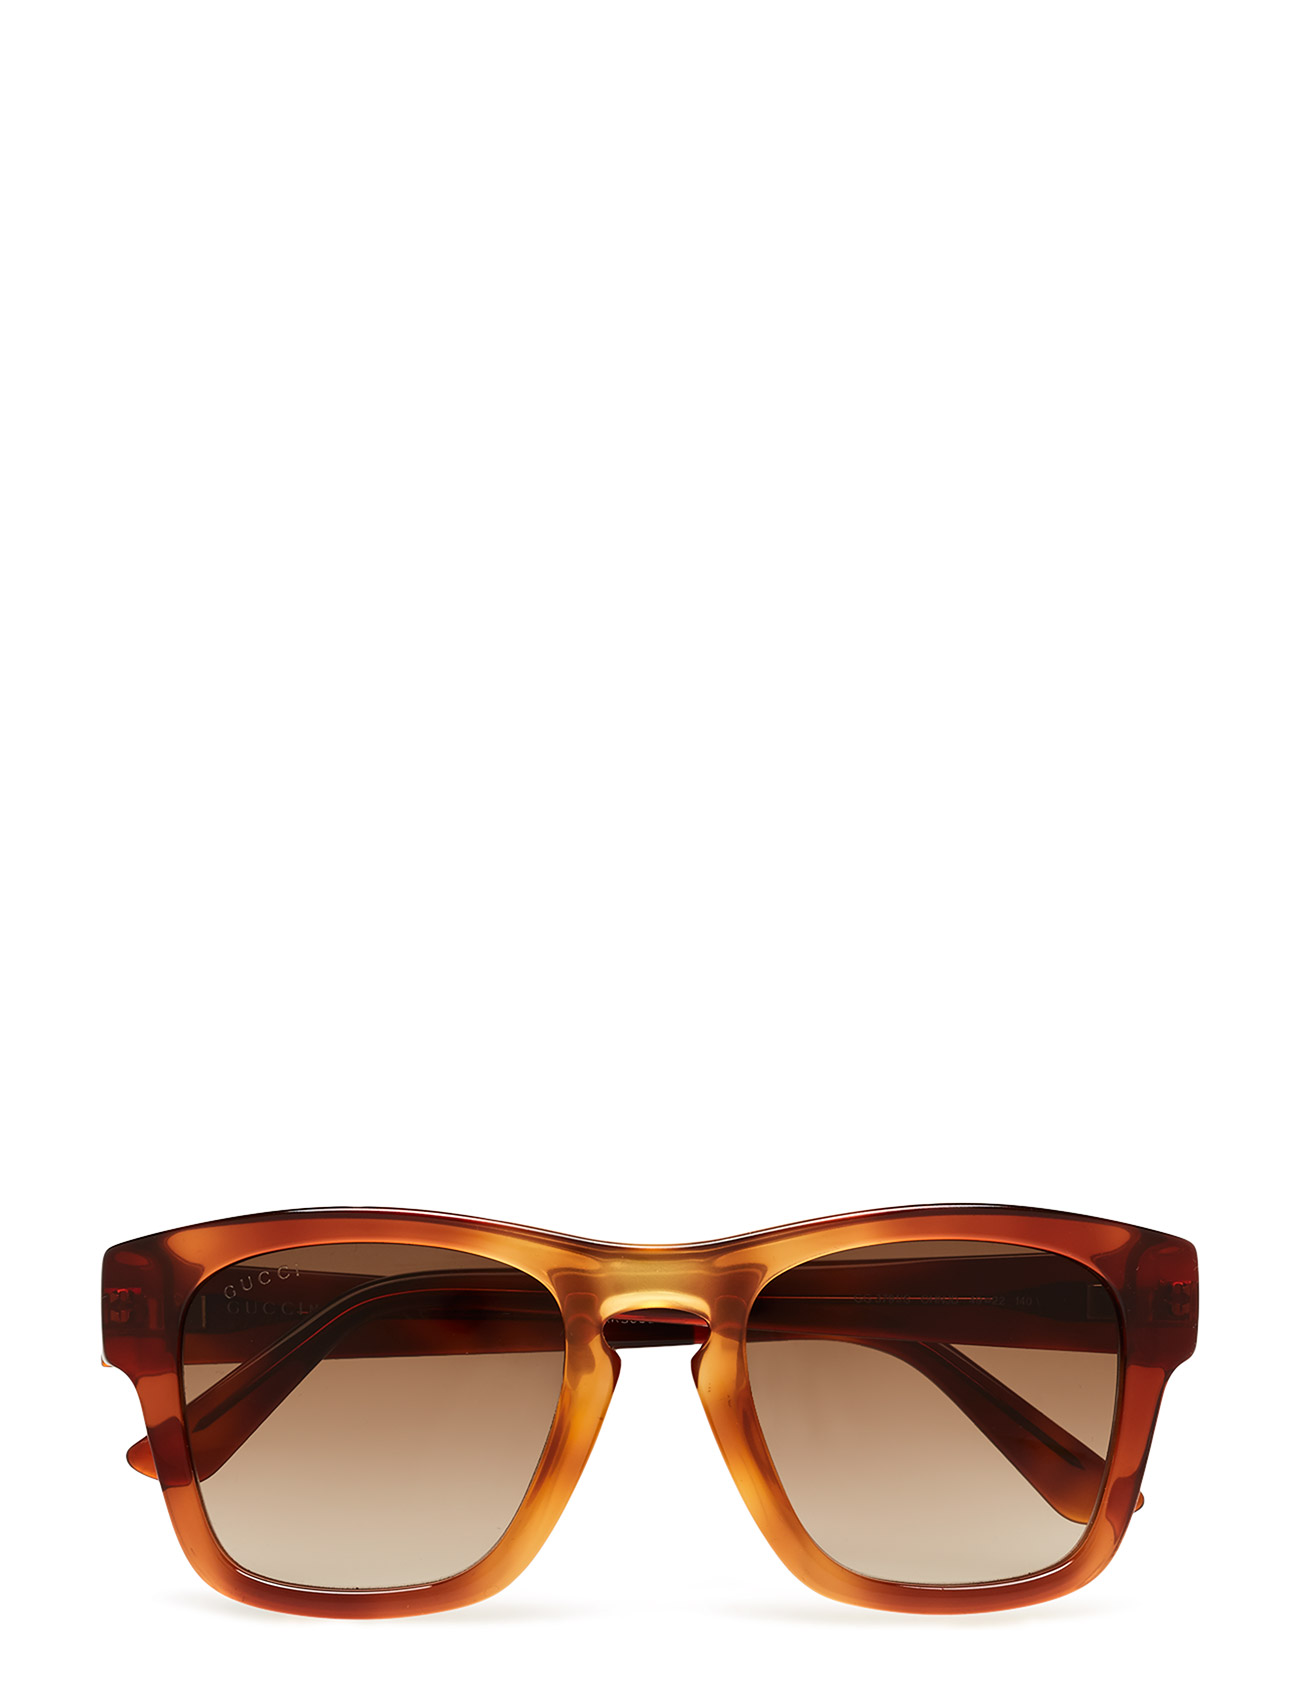 Gg 3771/S Gucci Sunglasses Solbriller til Damer i